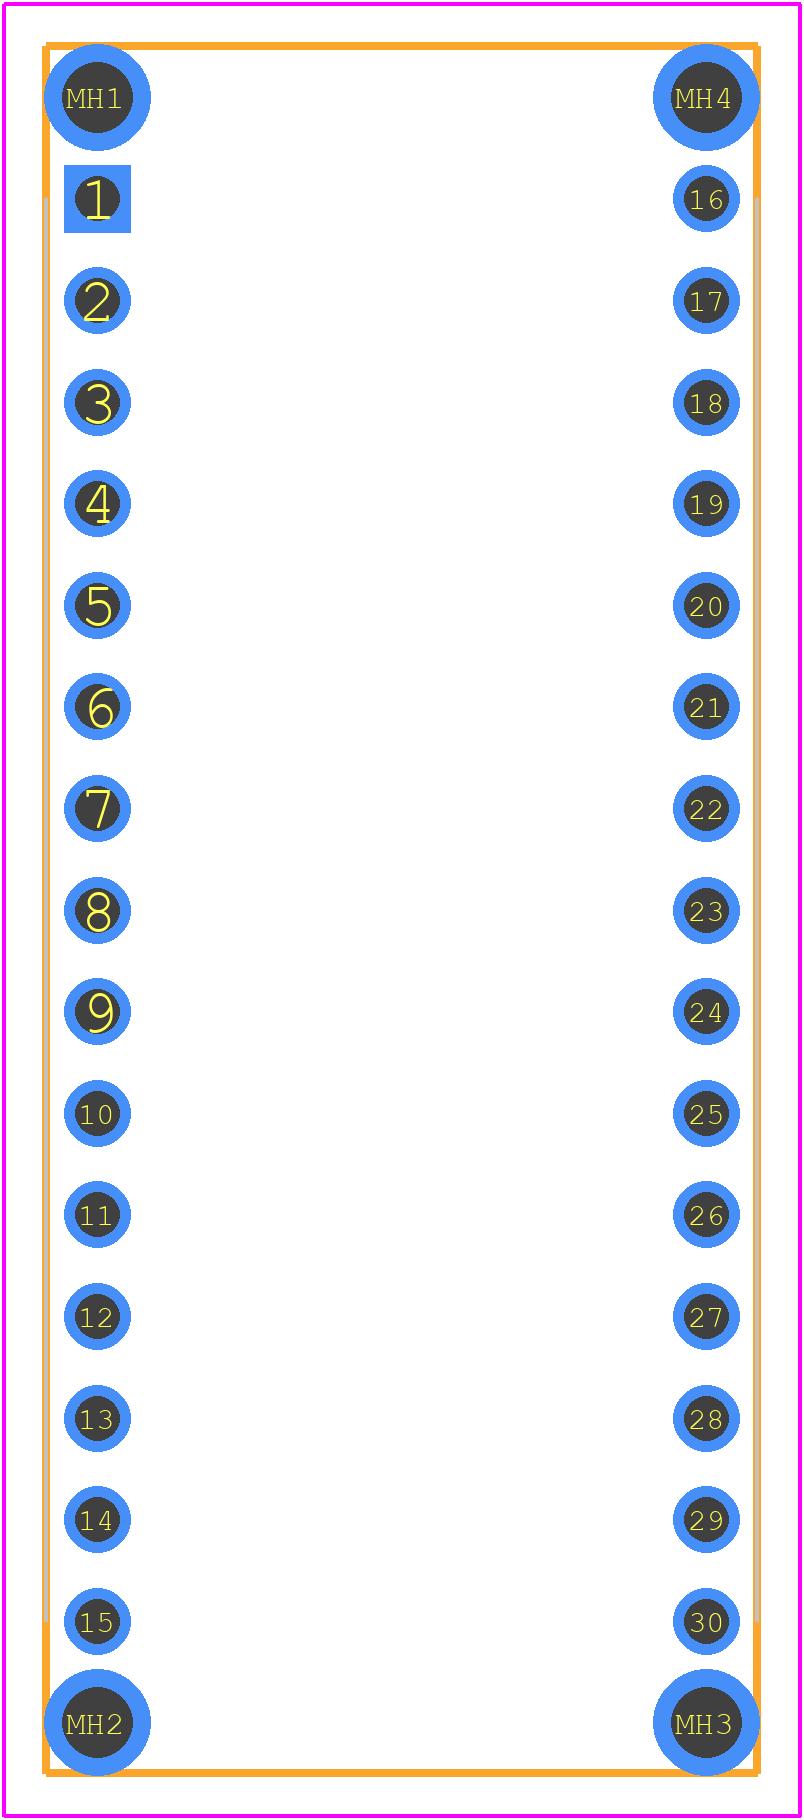 ARD-NANO30NP - Gravitech PCB footprint - Other - ARD-NANO30NP-4